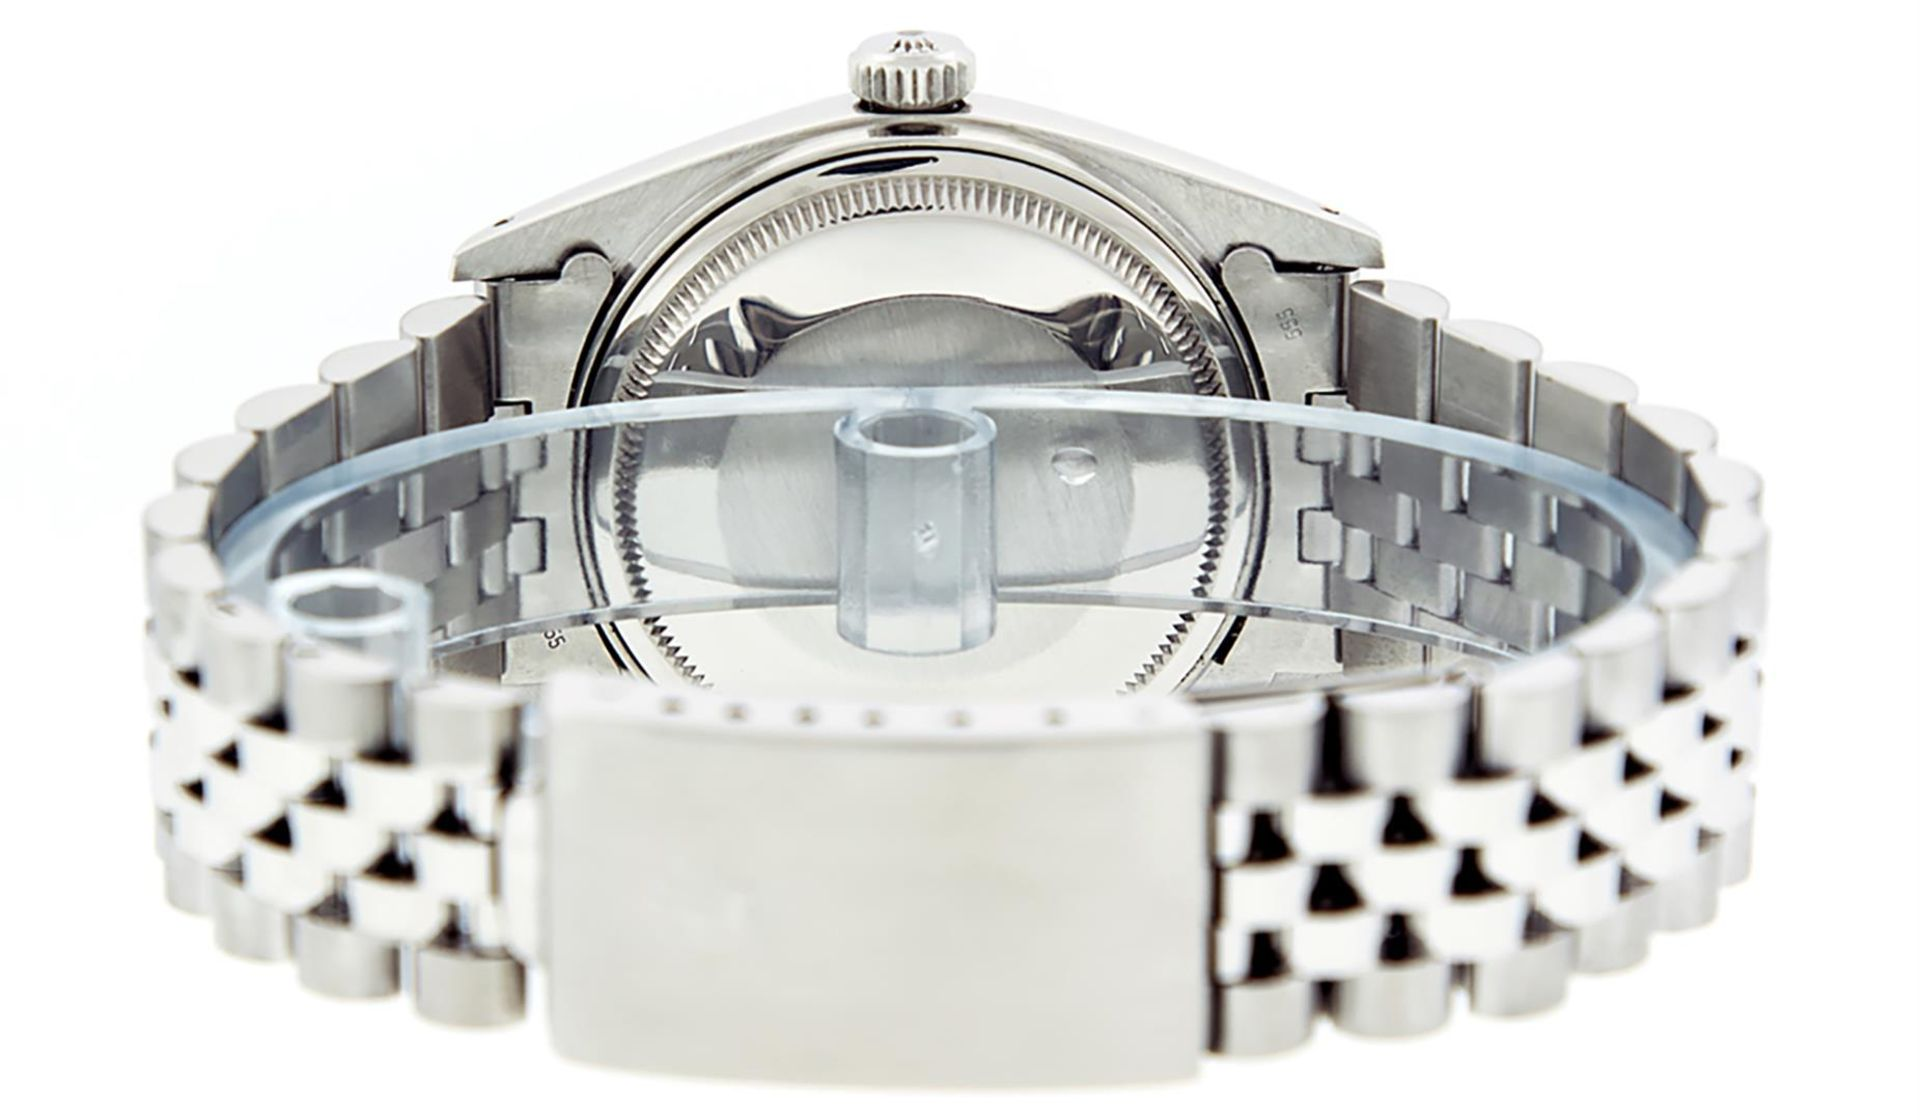 Rolex Mens Stainless Steel 36MM Blue Diamond Datejust Wristwatch - Image 7 of 9